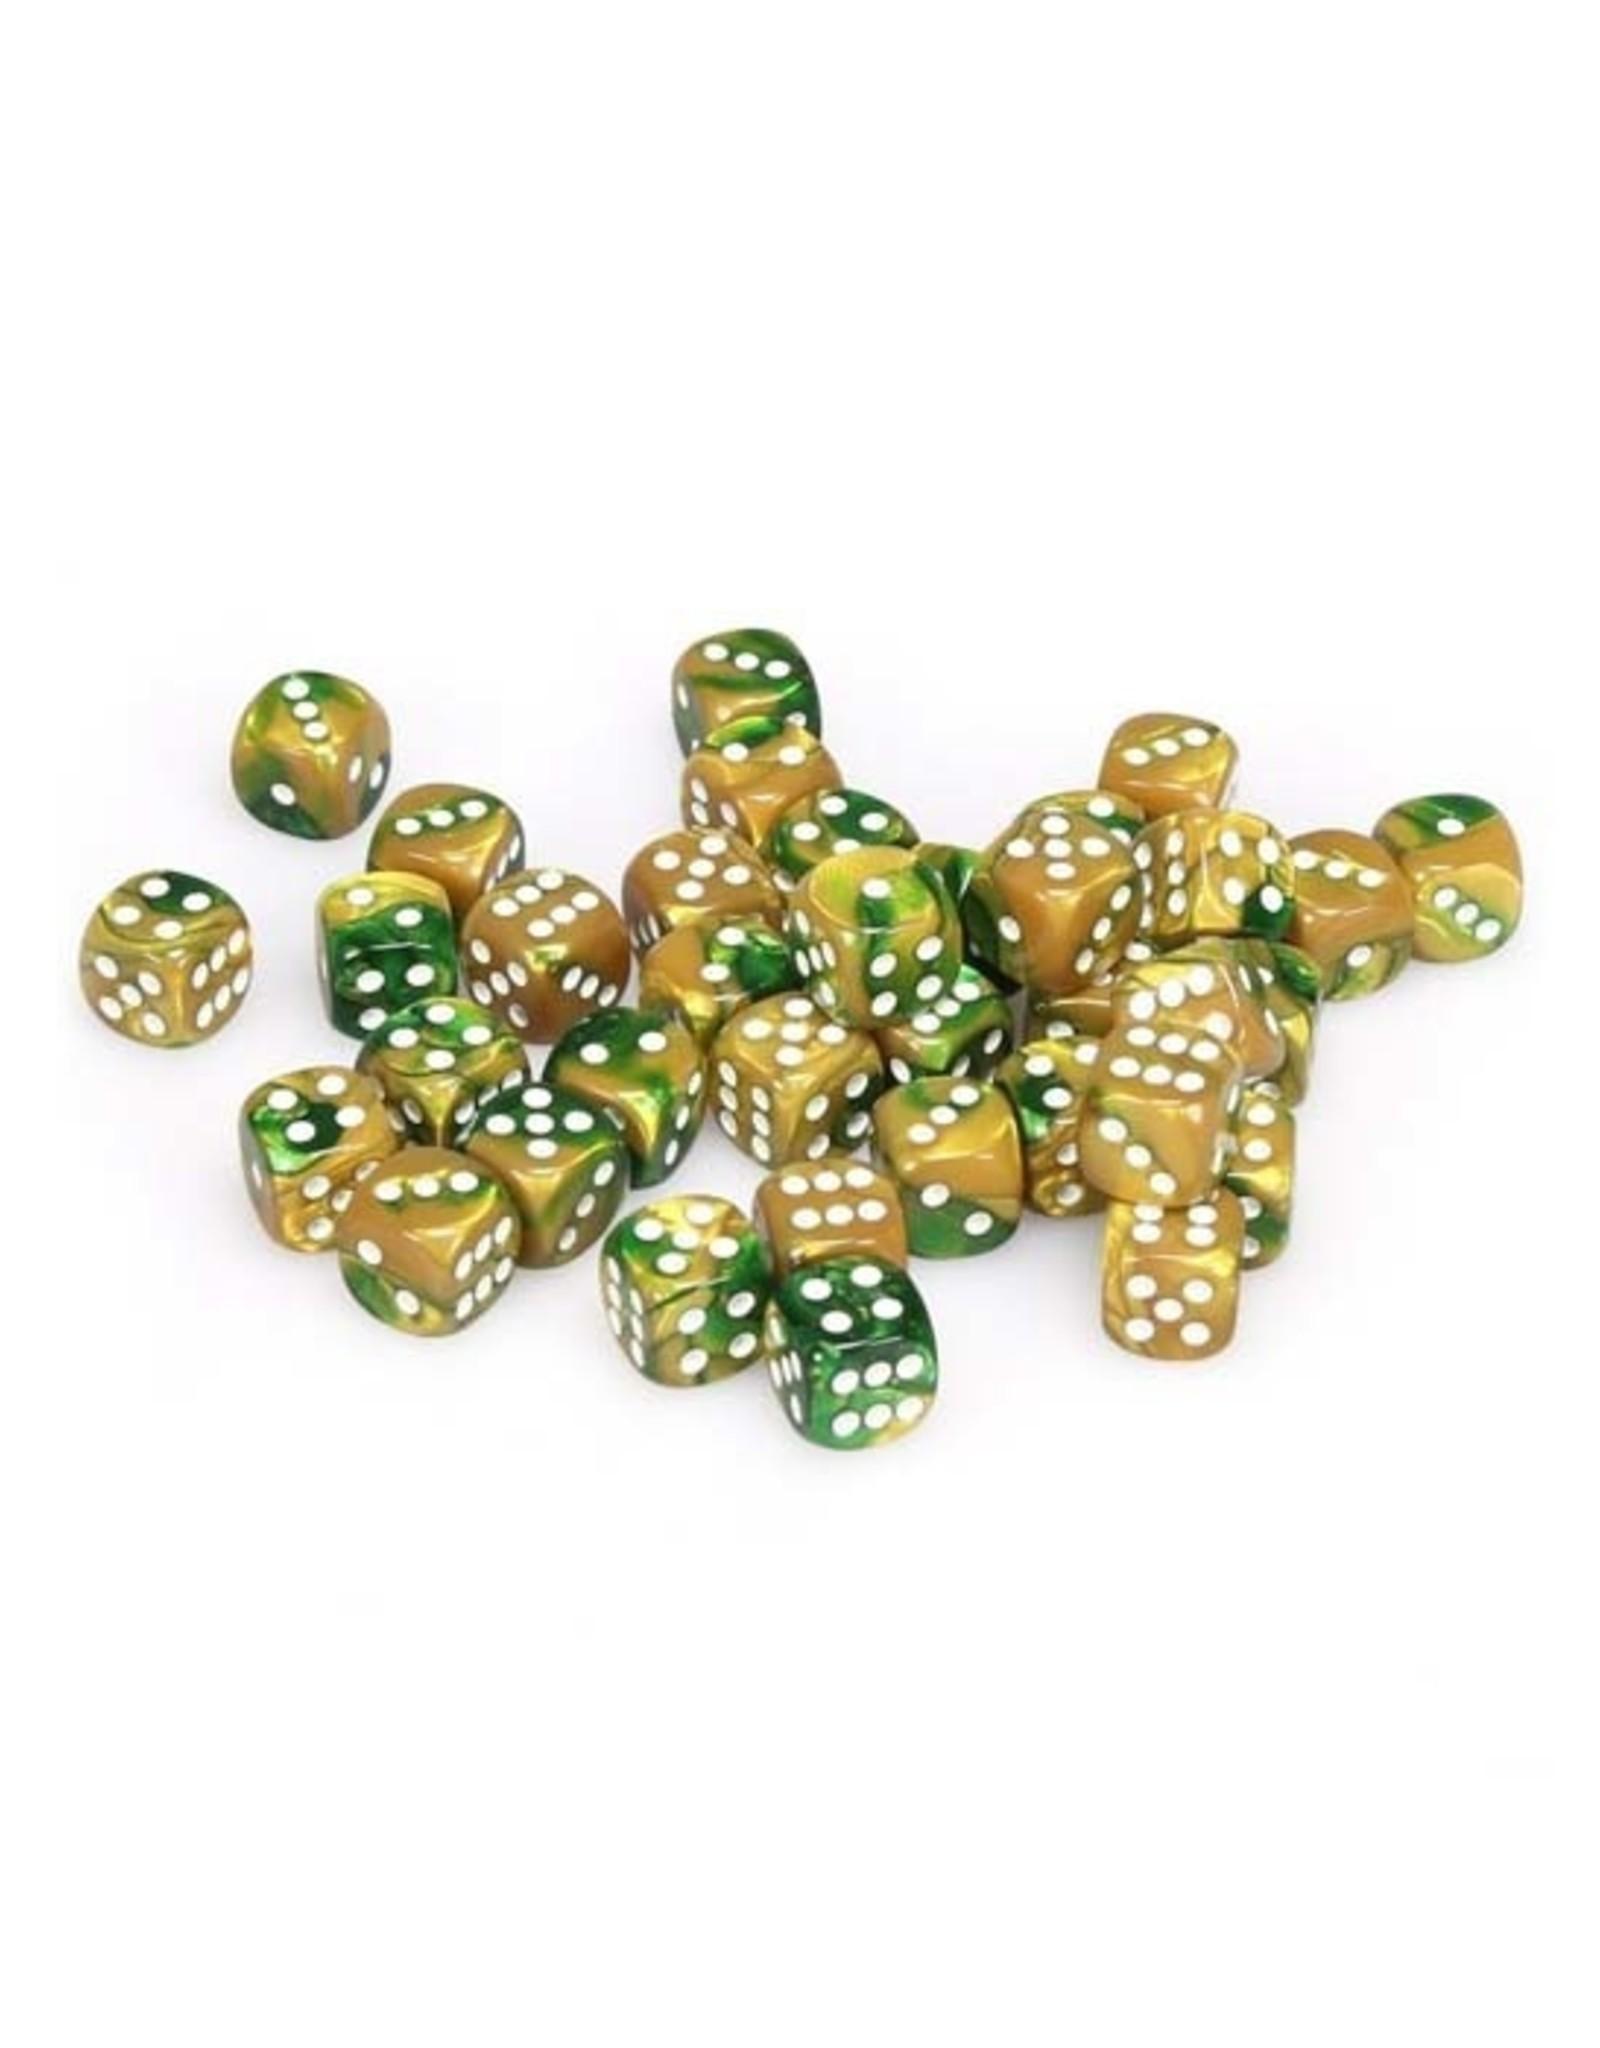 Chessex Chessex: 12mm D6 - Gemini - Gold-Green w/ White